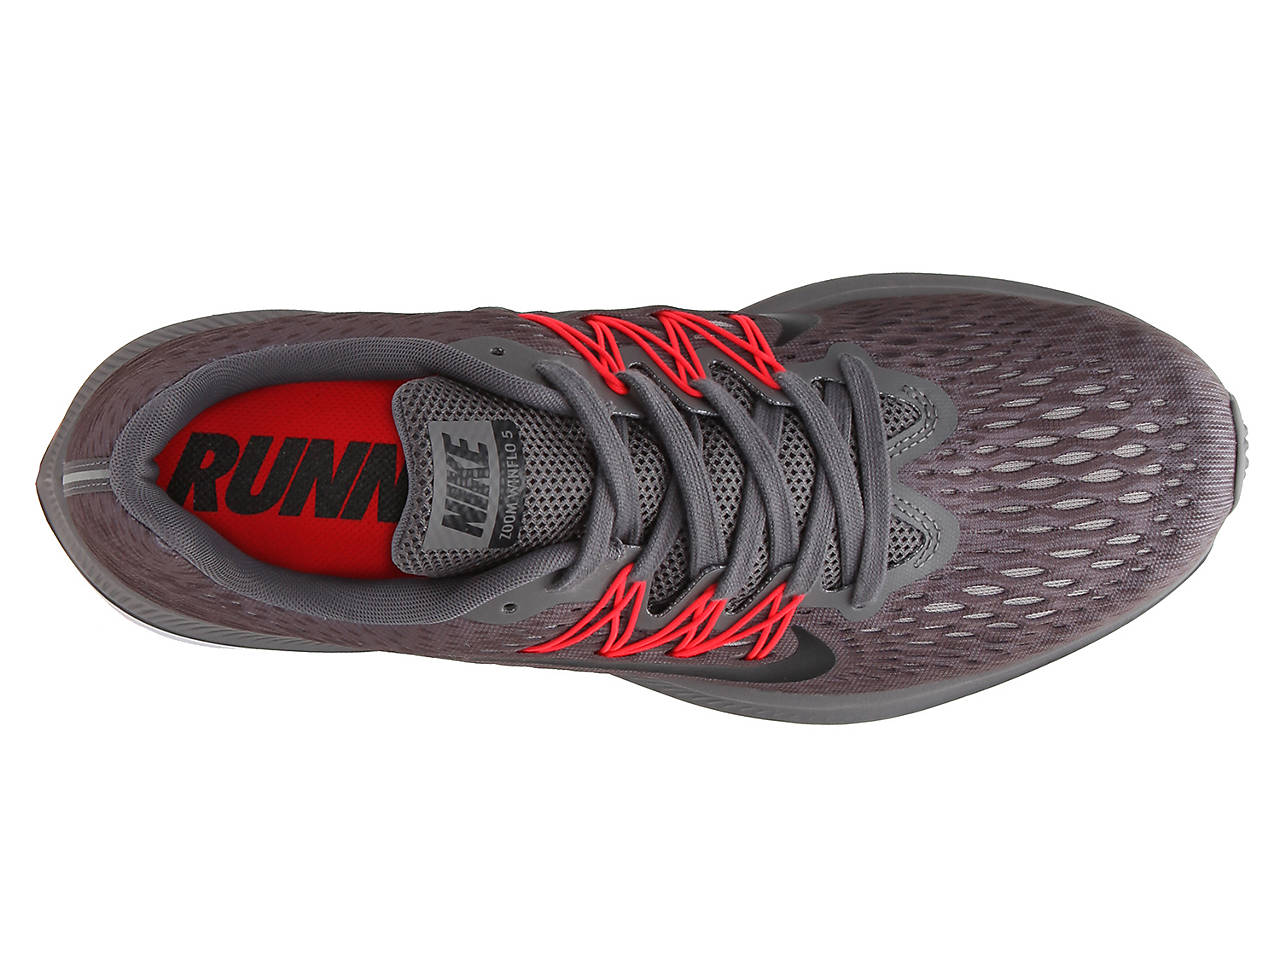 huge selection of 3f49b a514e Zoom Winflo 5 Lightweight Running Shoe - Men's